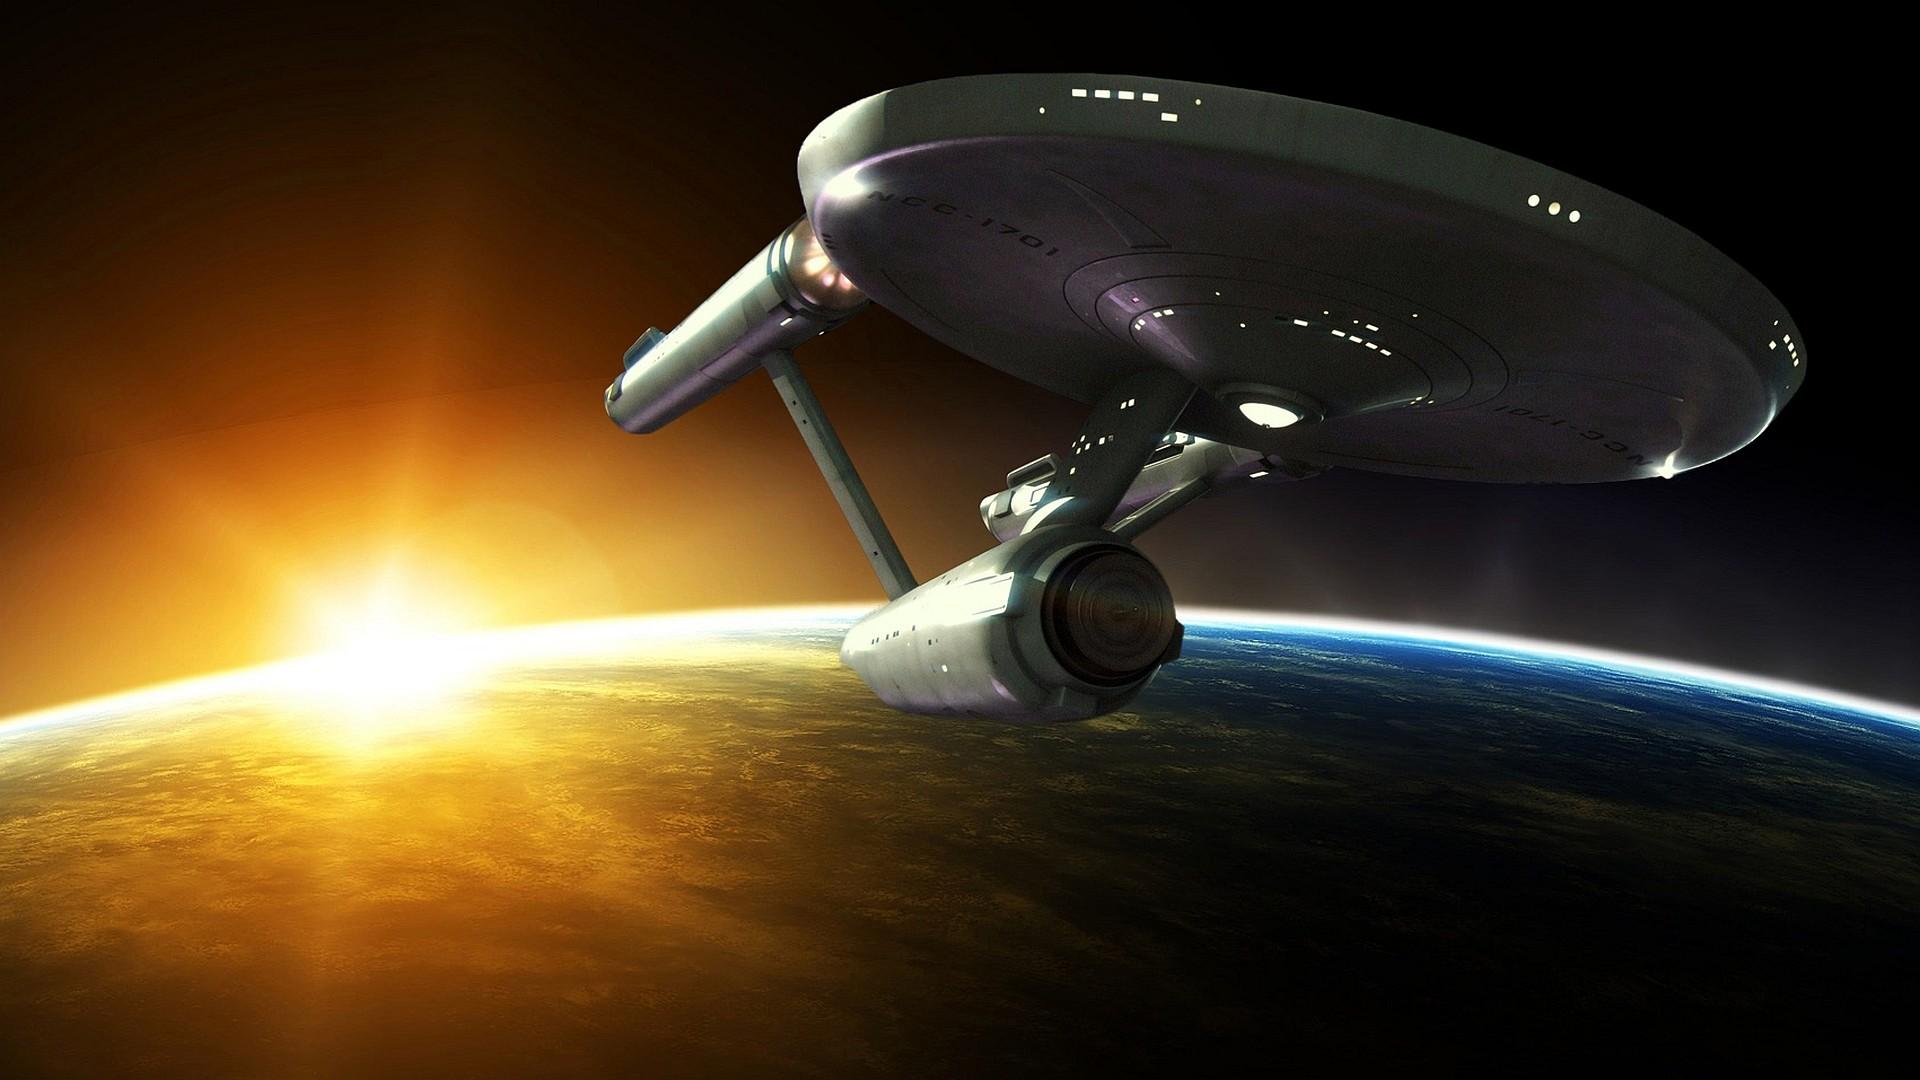 Star Trek: The Original Series Computer Wallpapers … Star Trek Iphone 6  Wallpaper